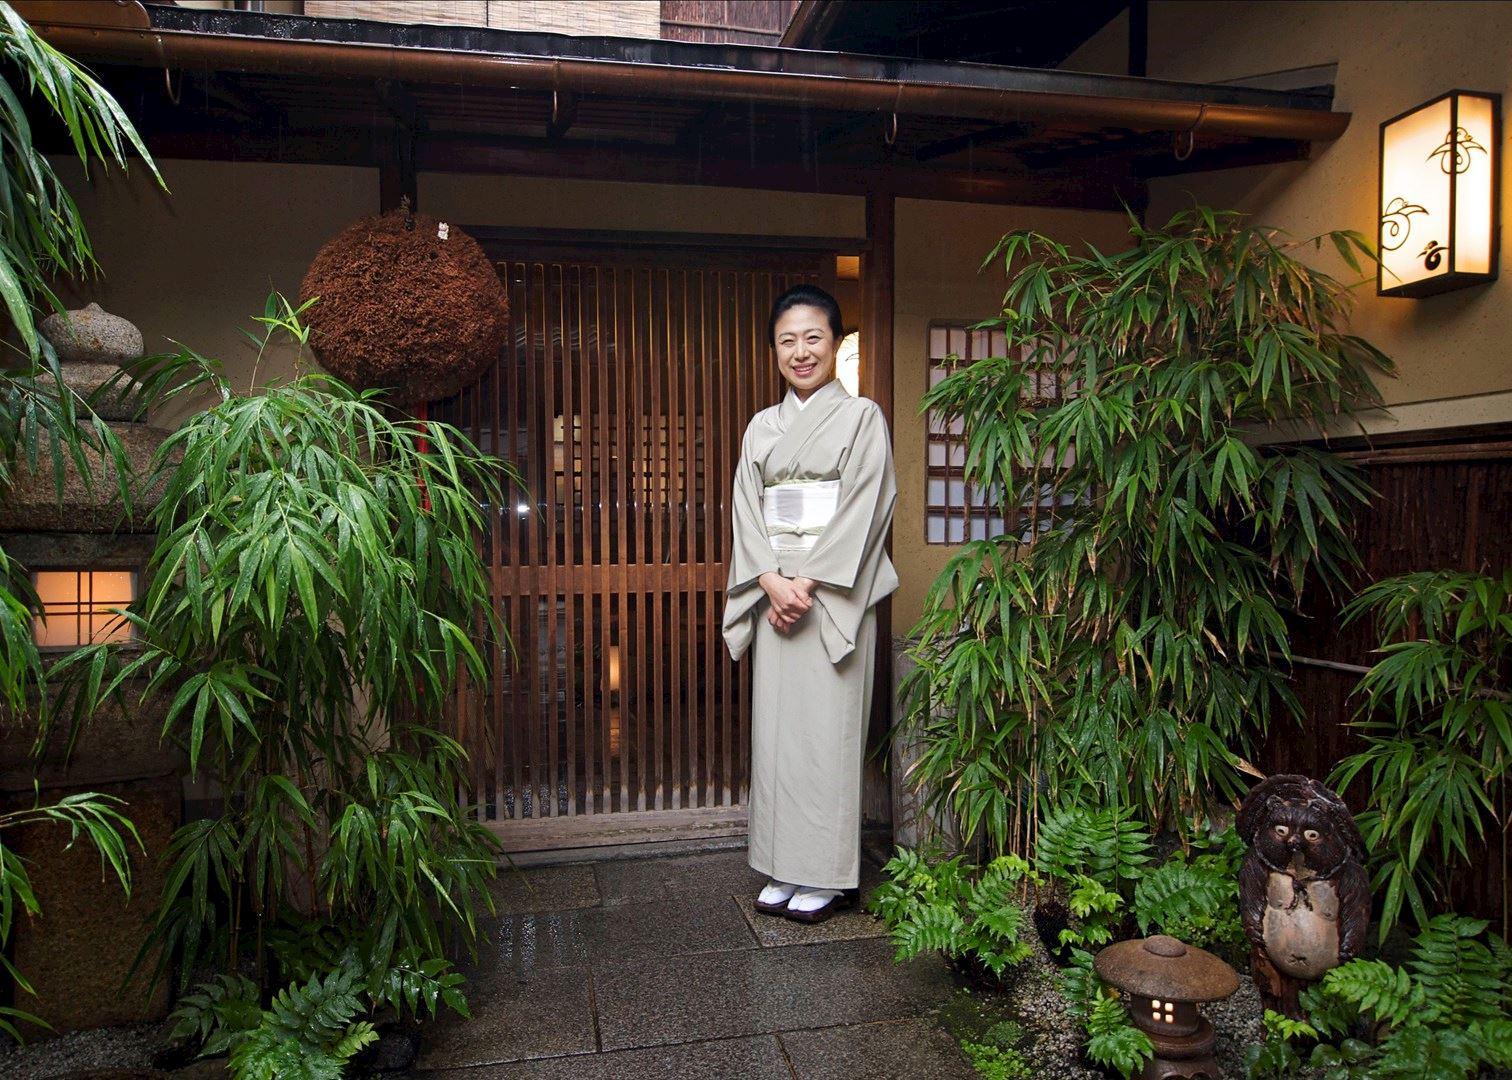 Yoshikawa Ryokan Hotels In Kyoto Audley Travel